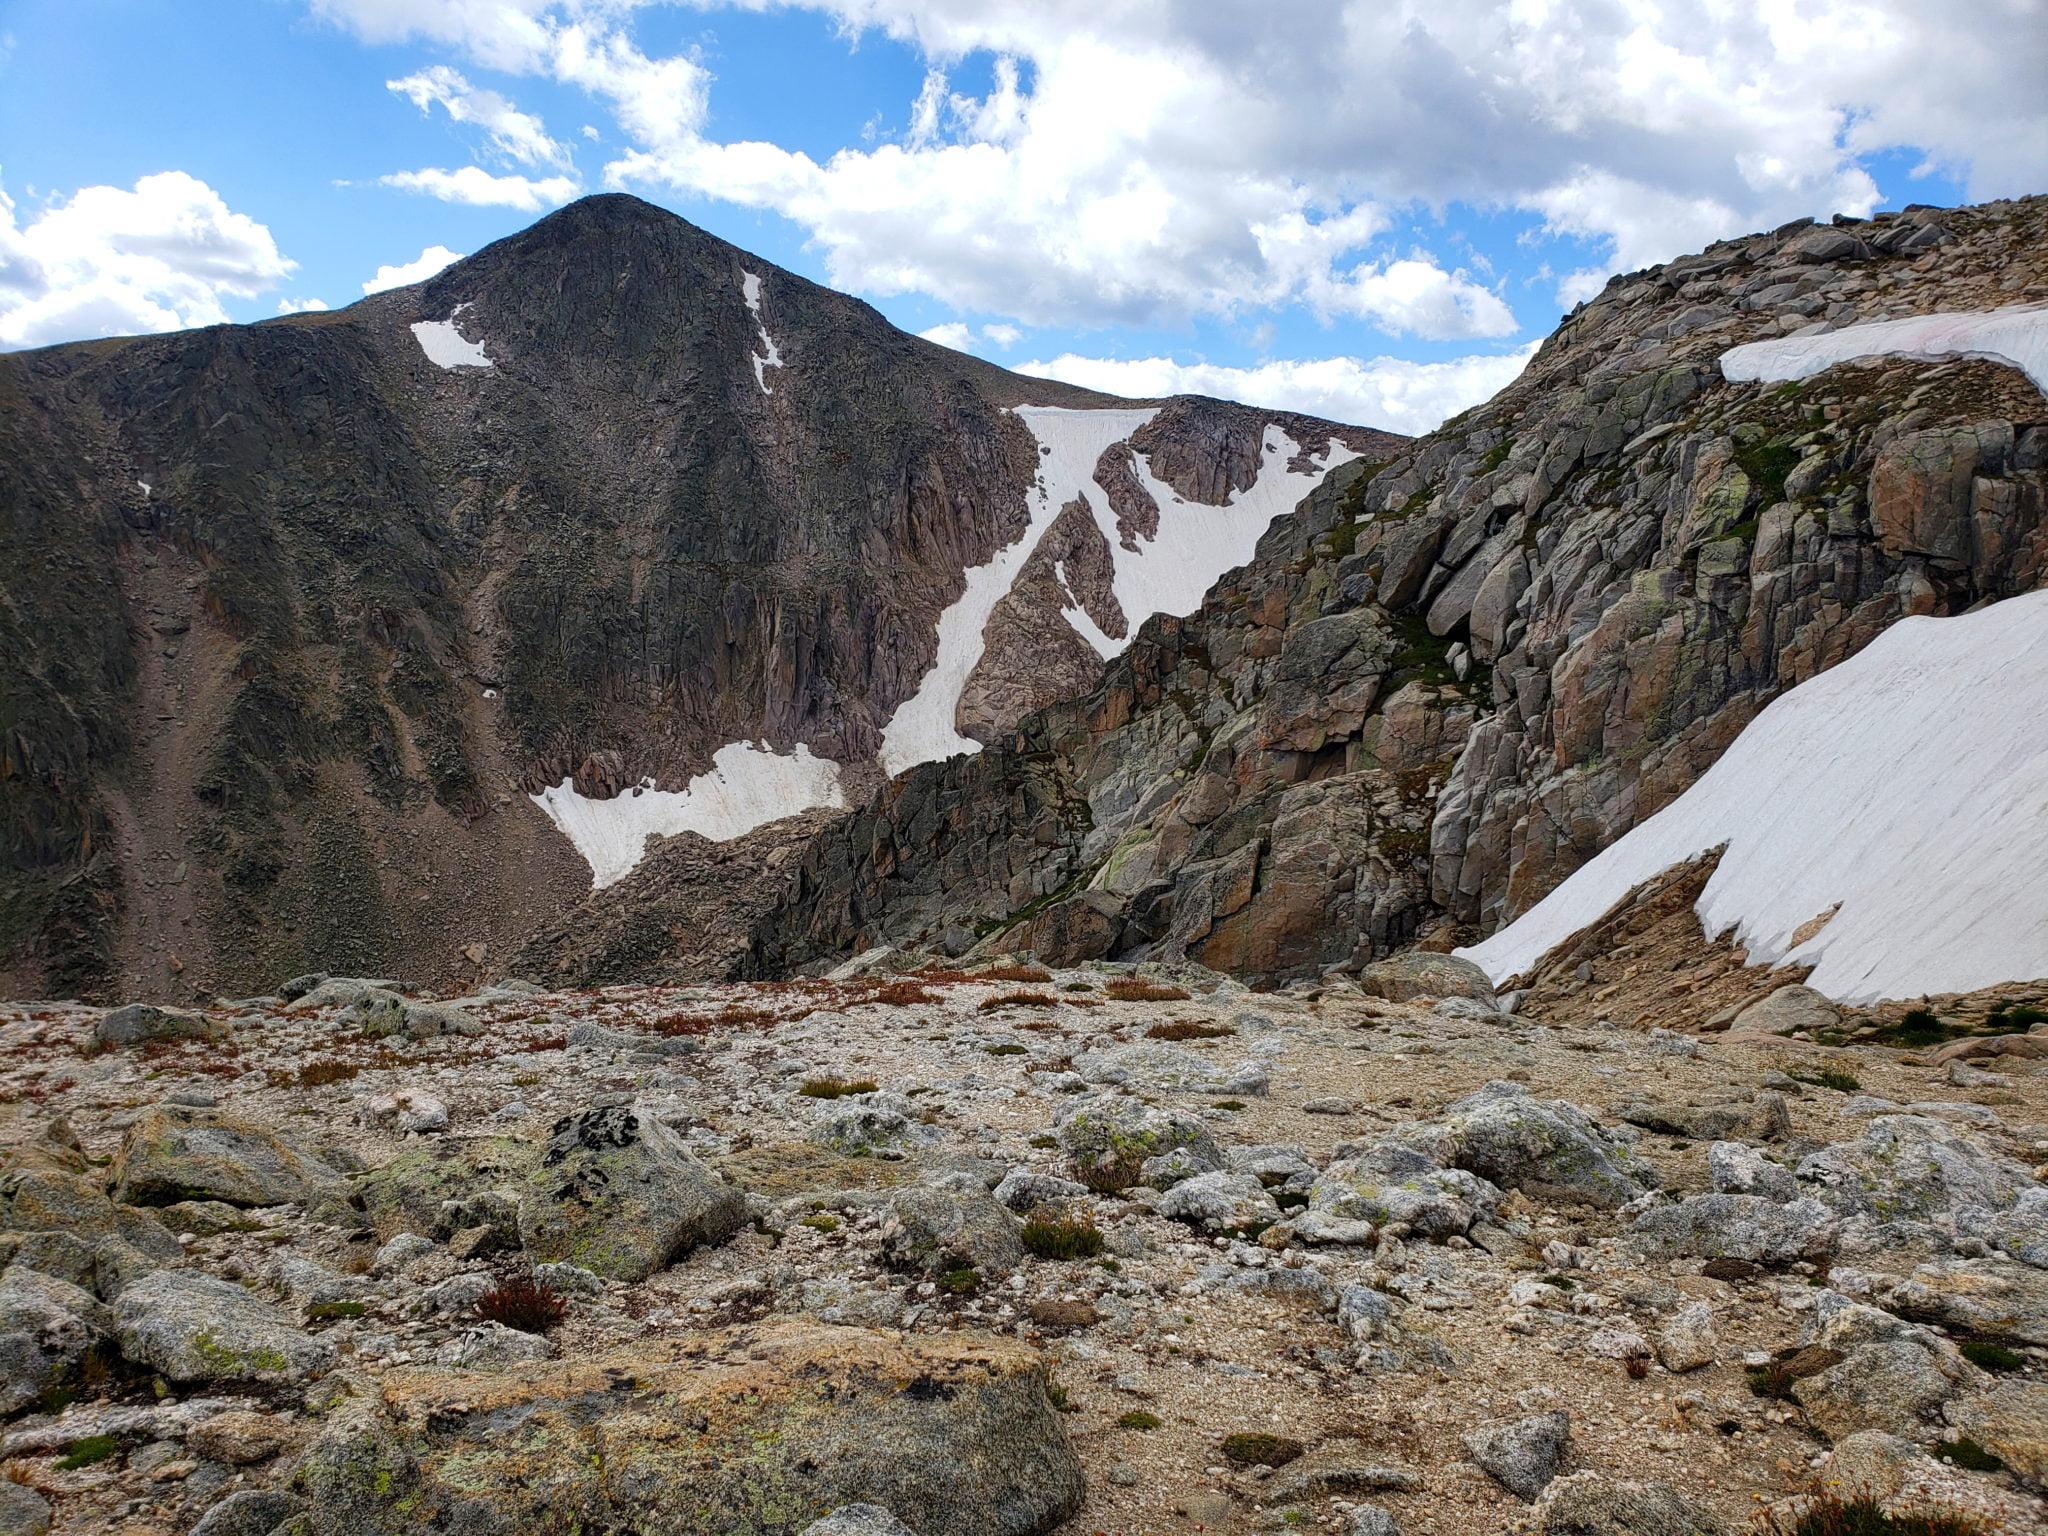 Hallett Peak (12,713